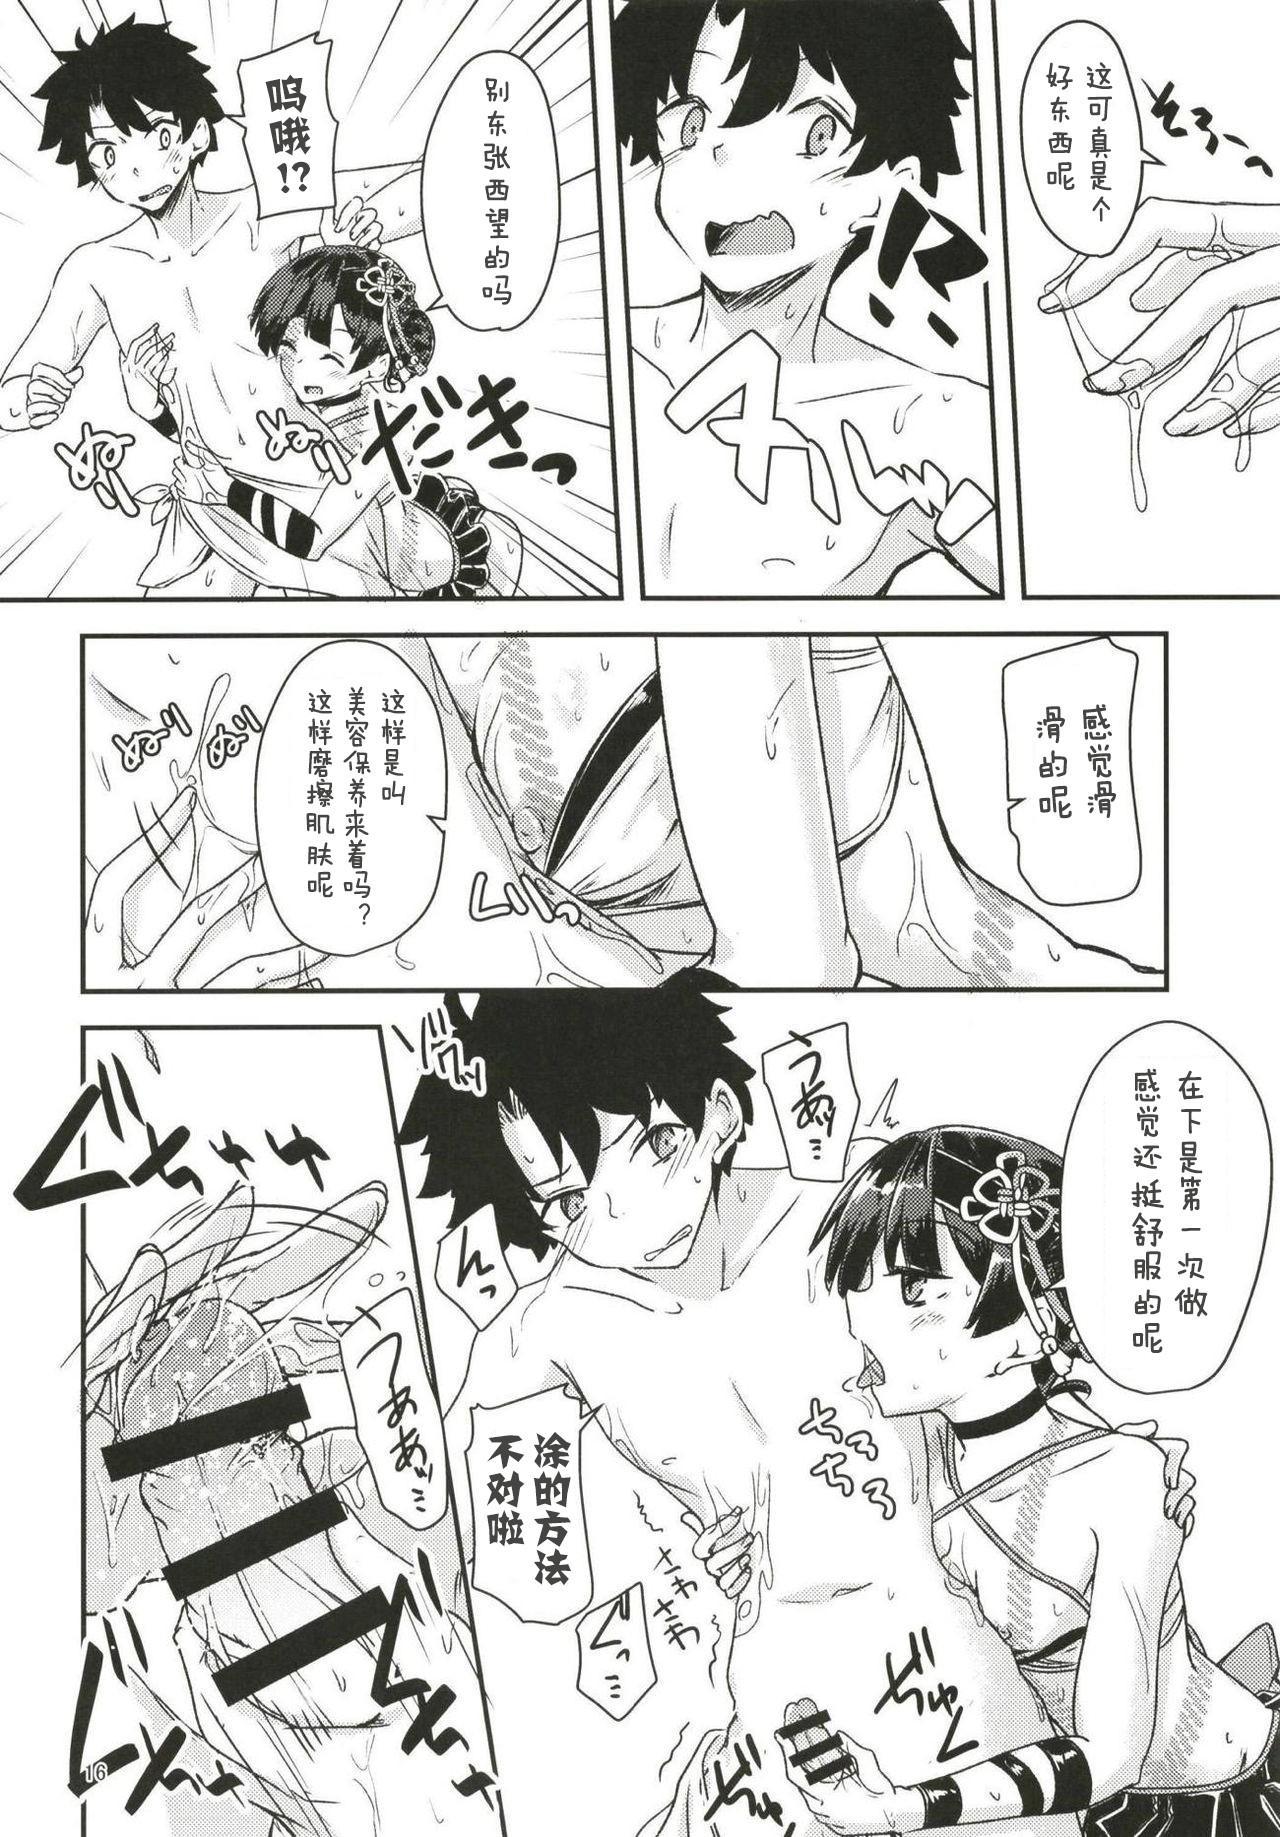 Paraiso Chii-chan to Yukemuri de Hawawa! 14